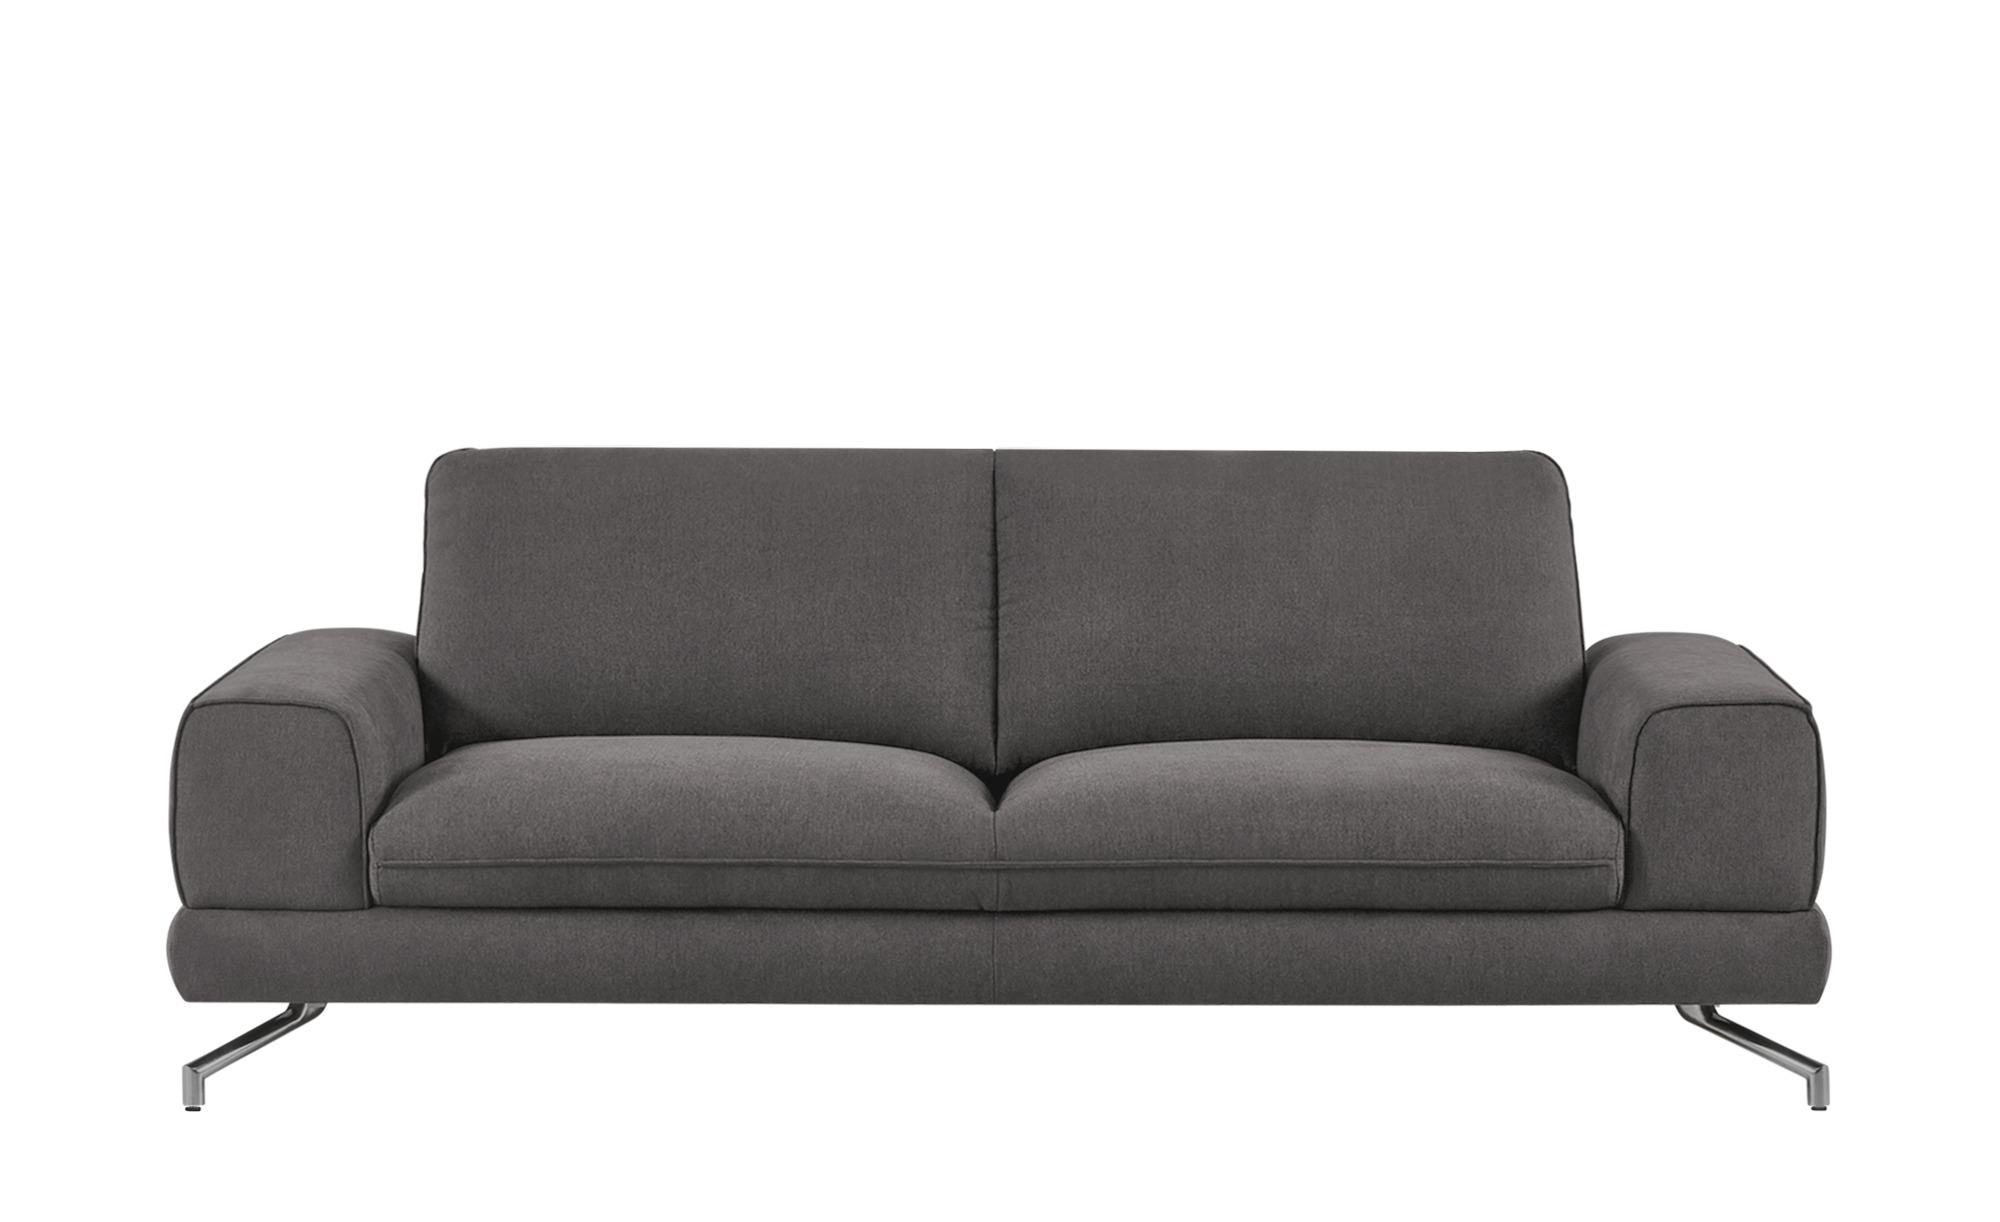 smart Sofa 3-sitzig dunkelgrau - Stoff Bonika ¦ grau ¦ Maße (cm): B: 218 H: 83 T: 95 Polstermöbel > Sofas > 3-Sitzer - Höffner